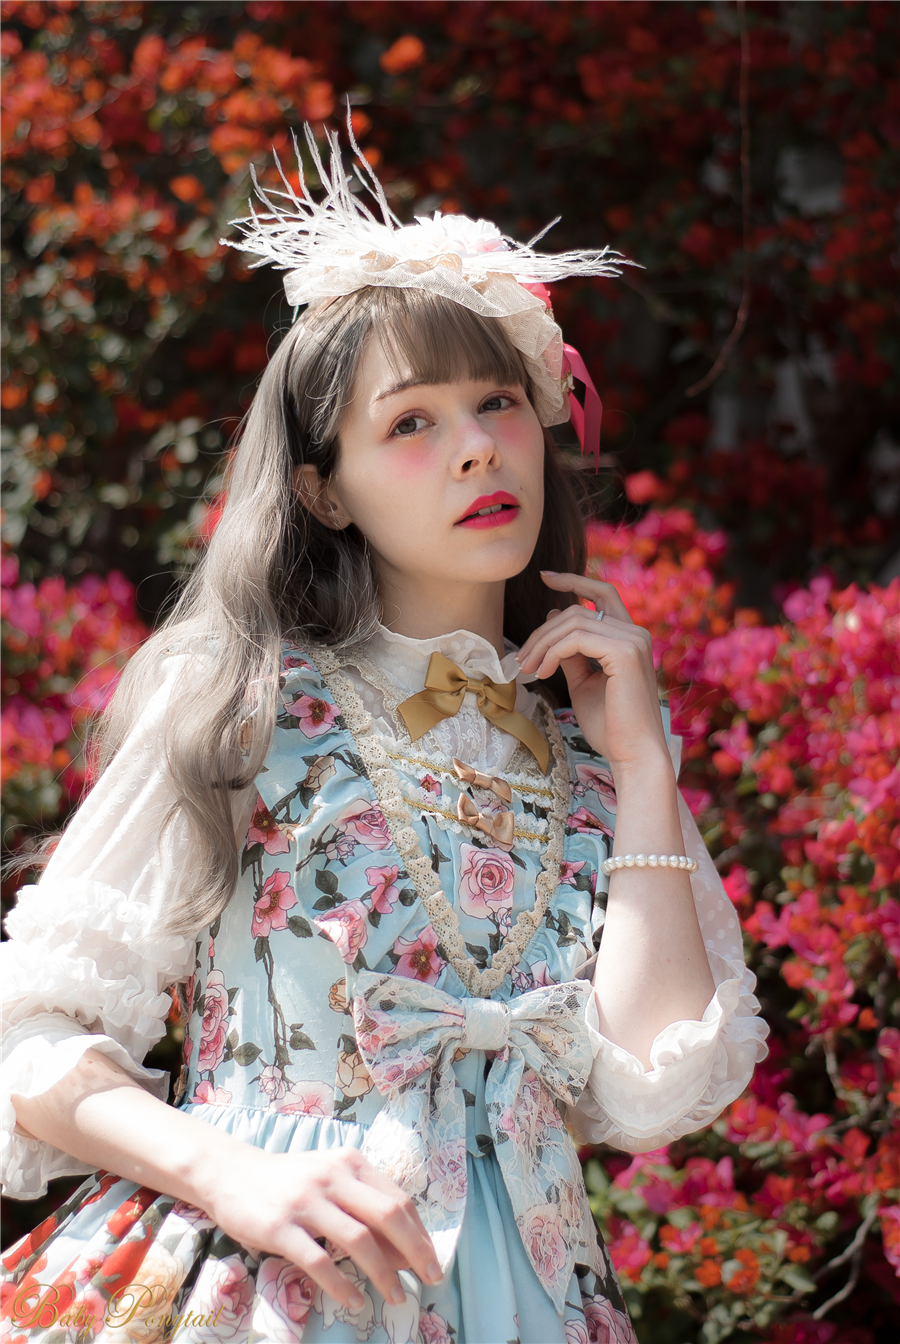 Baby Ponytail_Model Photo_Polly's Garden of Dreams_JSK Sky_Claudia03.jpg